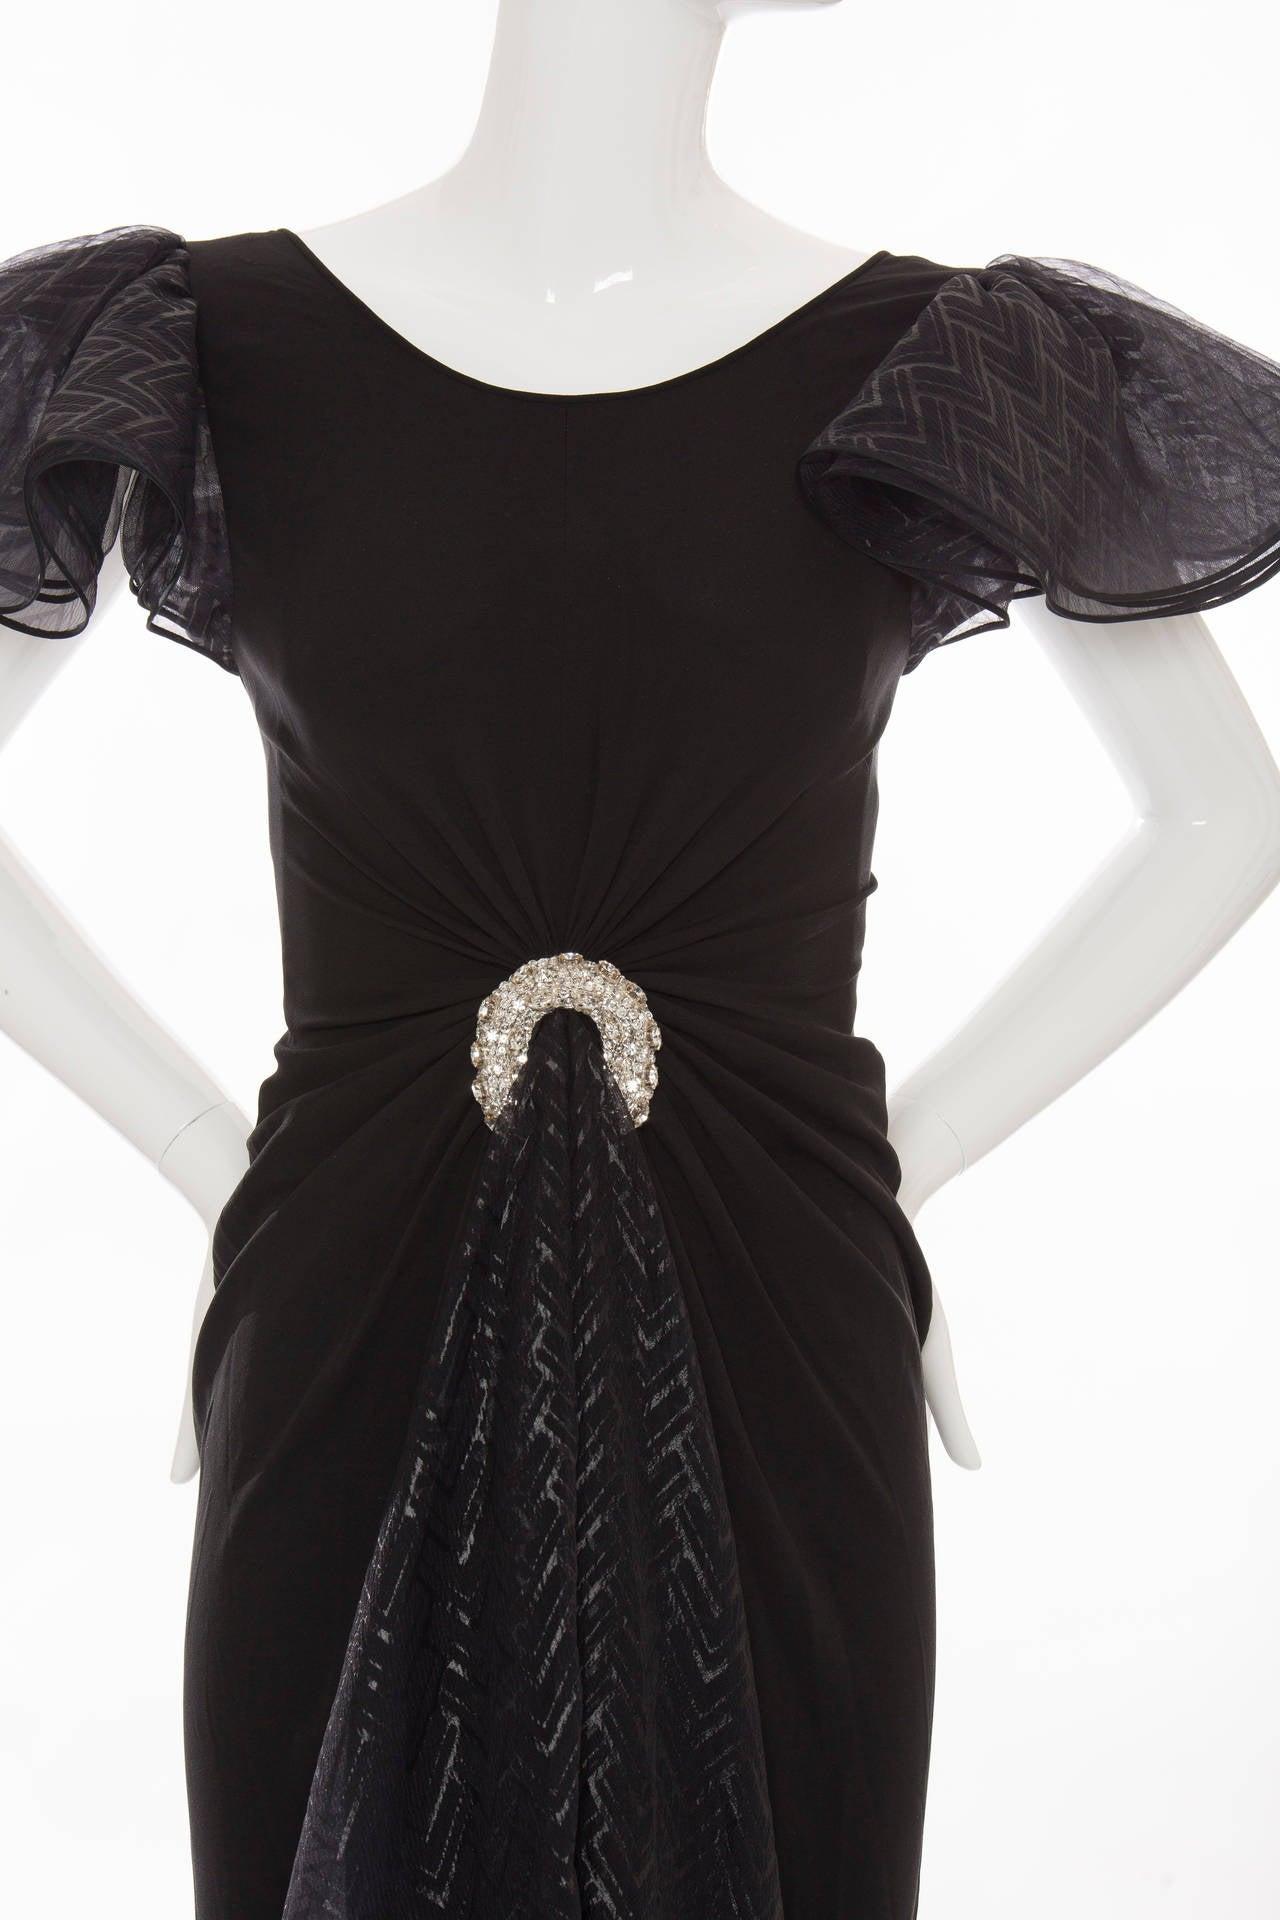 Valentino Haute Couture Silk Crepe And Printed Gazar Evening Dress, Circa 1980's 5